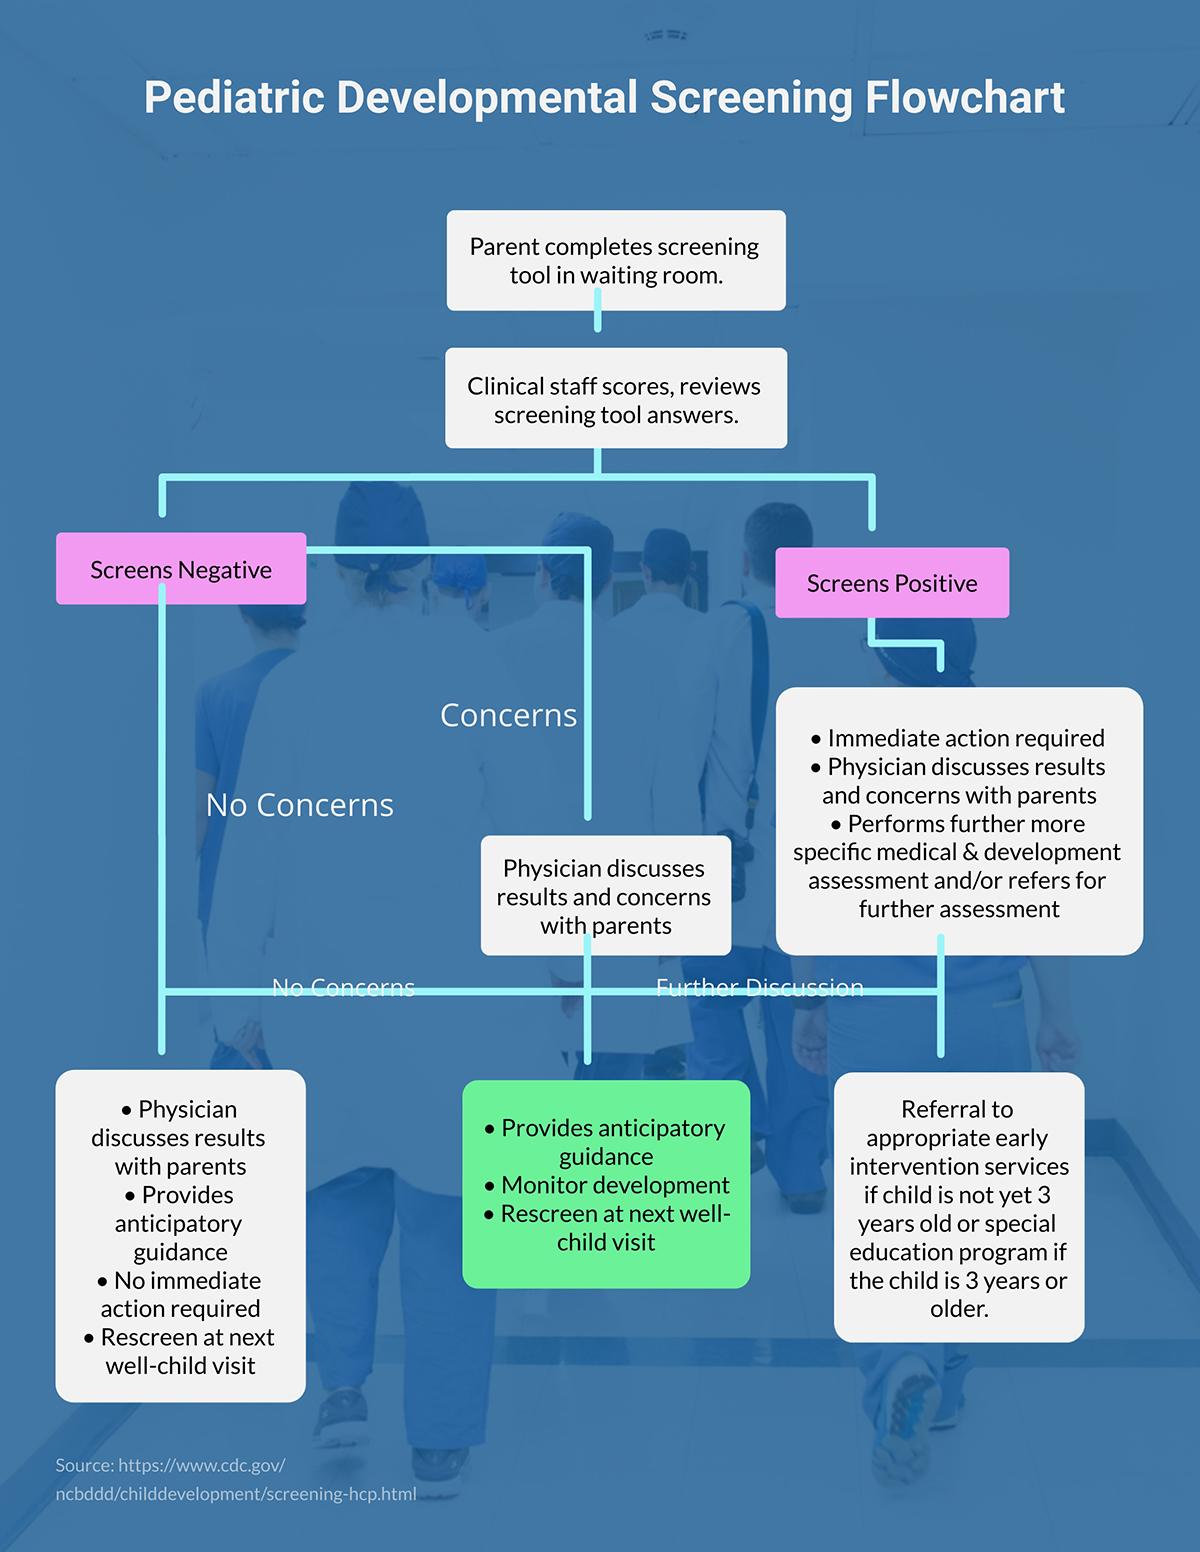 A pediatric development screening flowchart template.